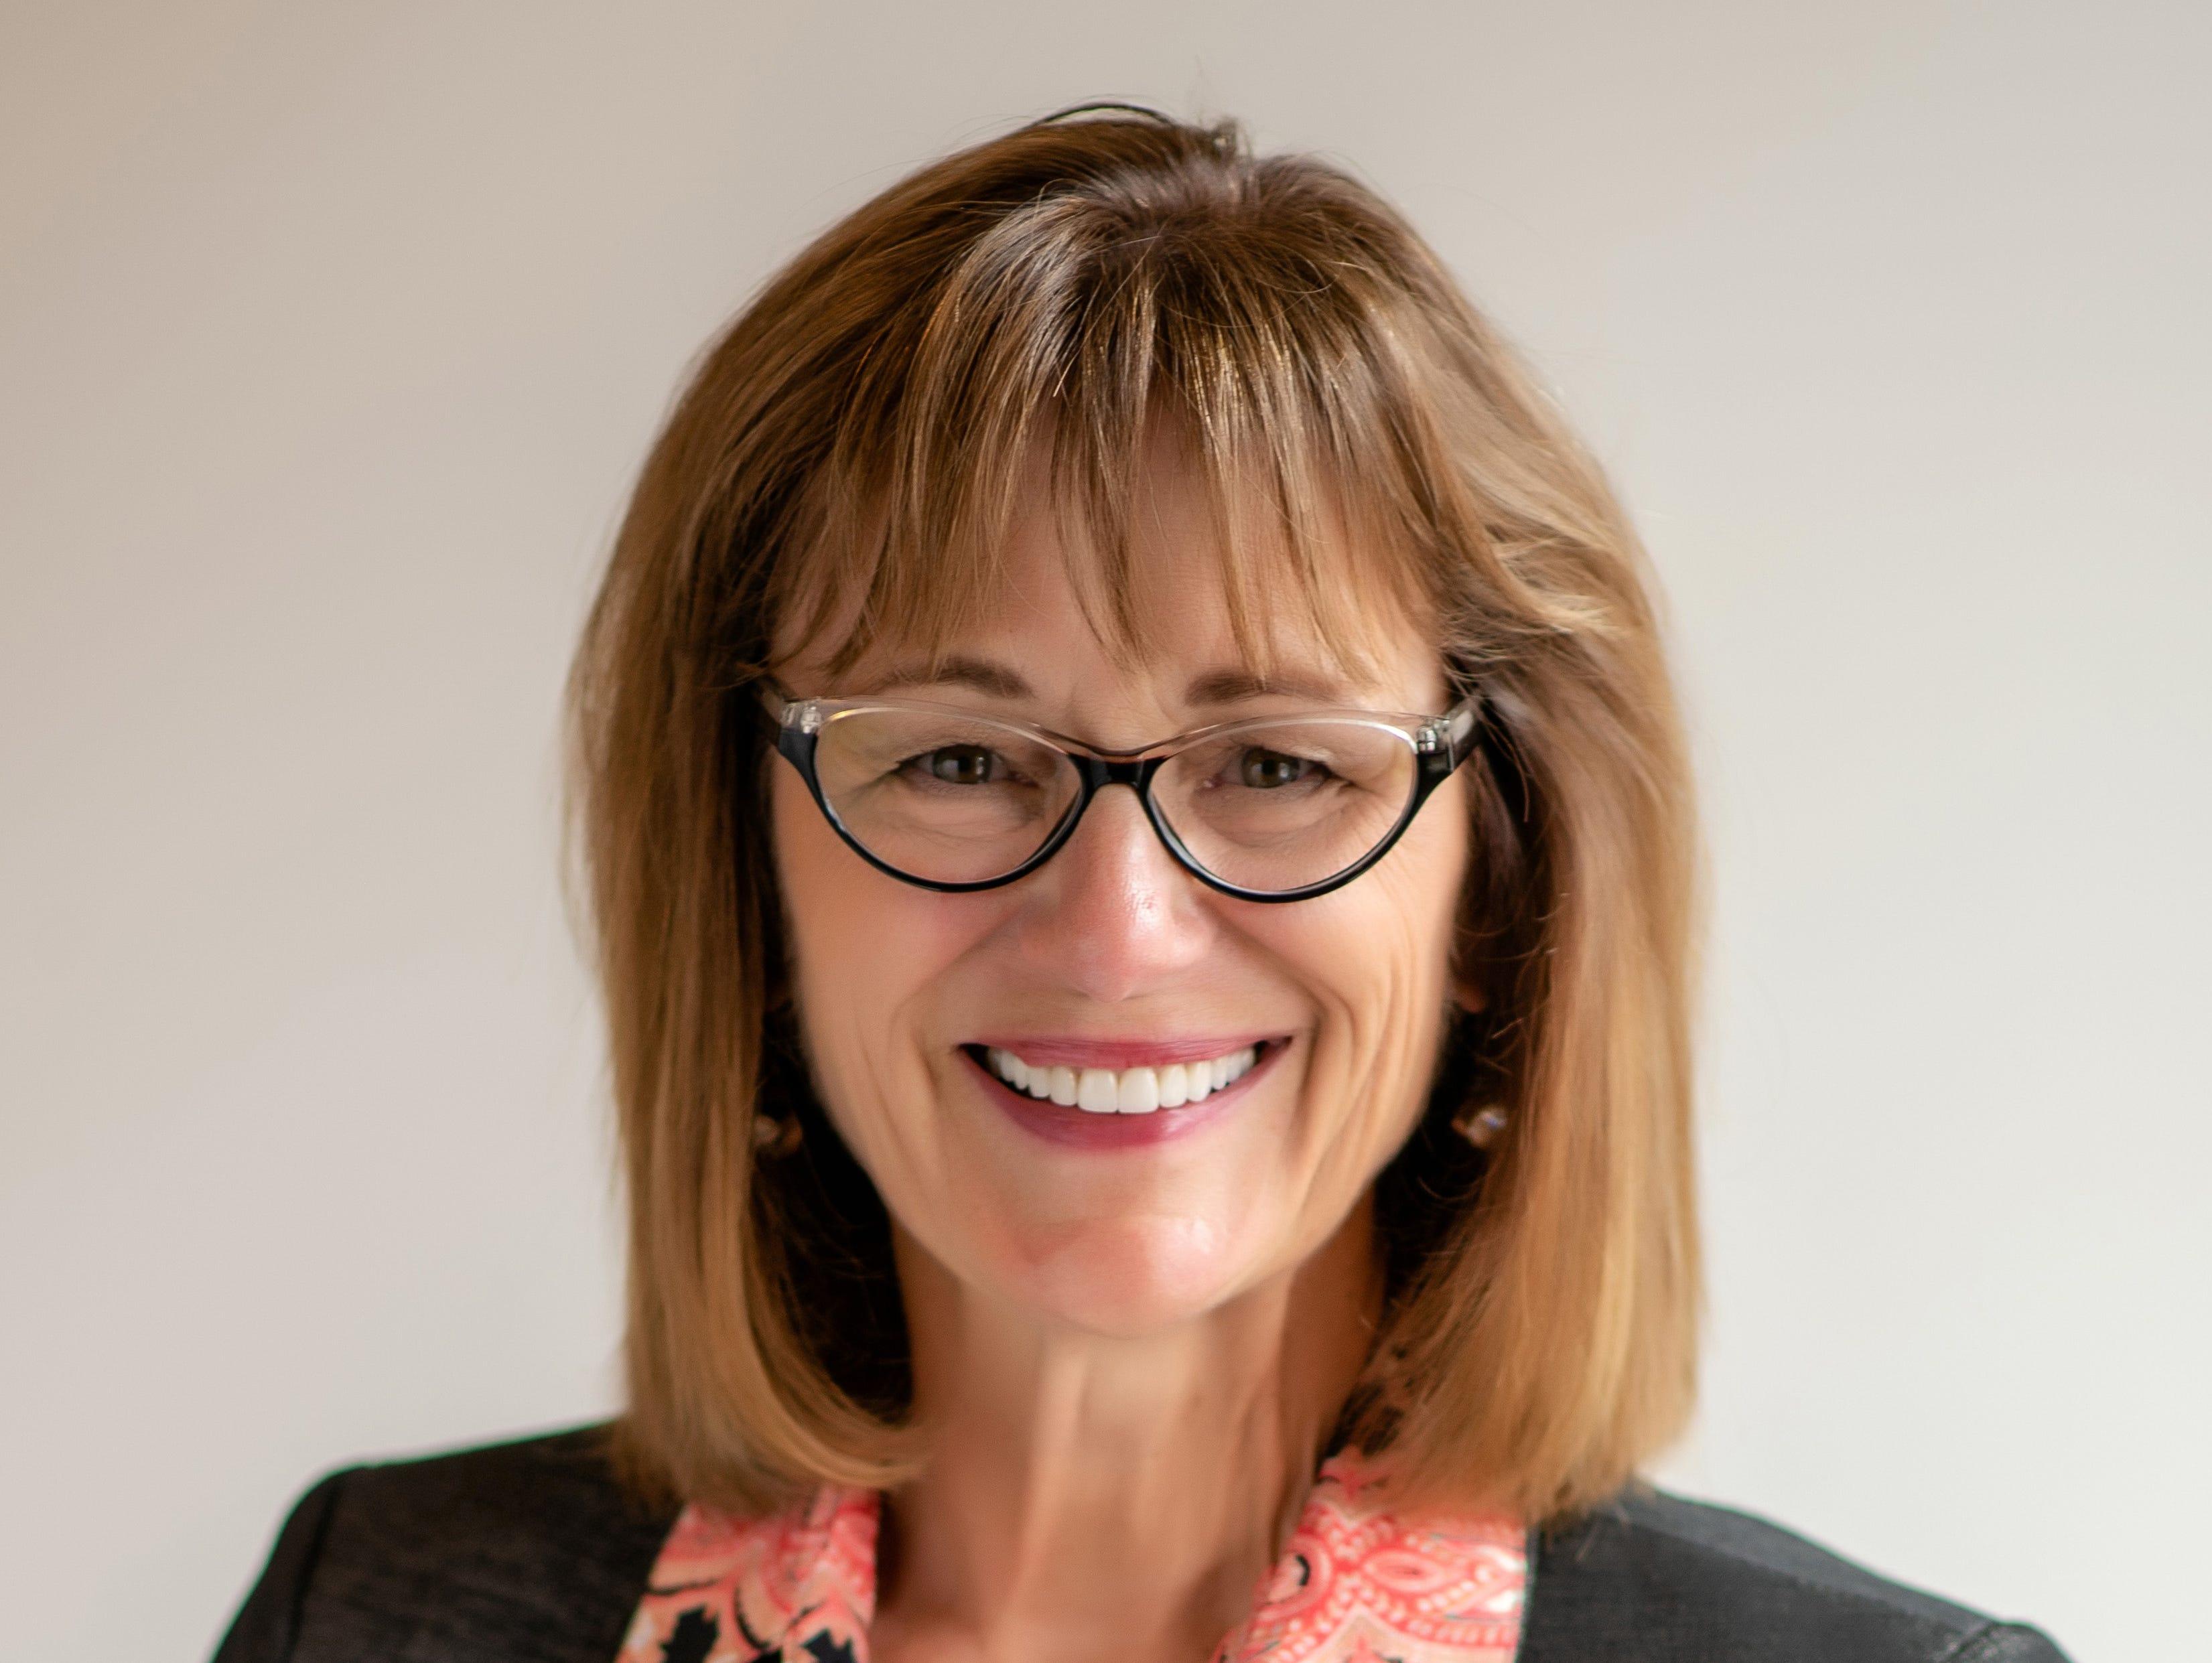 Deb Soholt is running to represent District 14 in the South Dakota Senate.